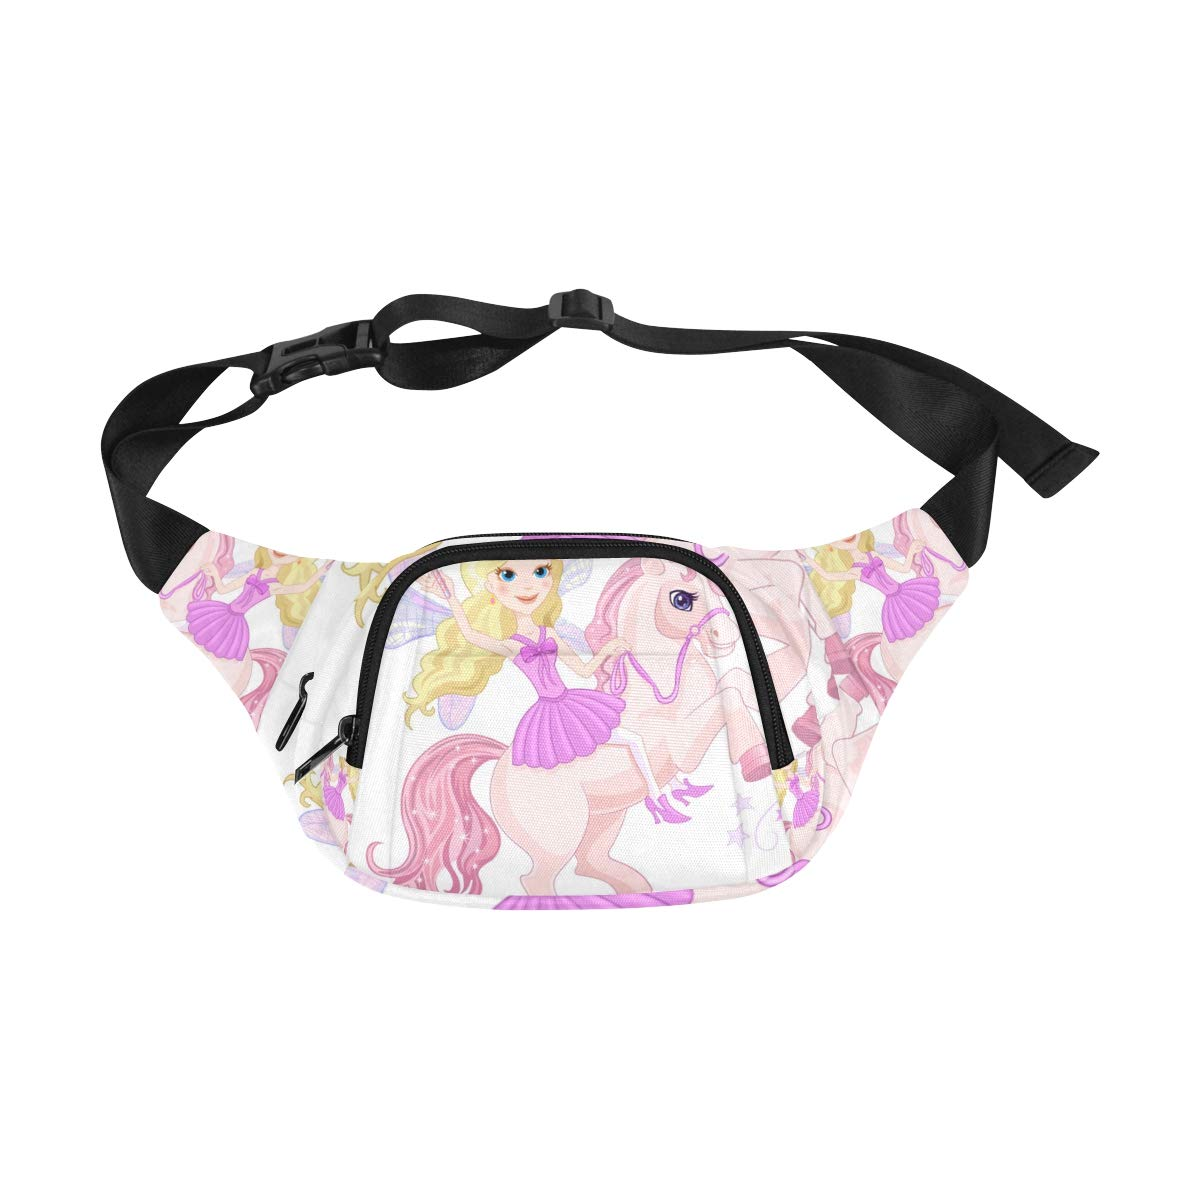 Little Unicorn With Princess Girl Fenny Packs Waist Bags Adjustable Belt Waterproof Nylon Travel Running Sport Vacation Party For Men Women Boys Girls Kids